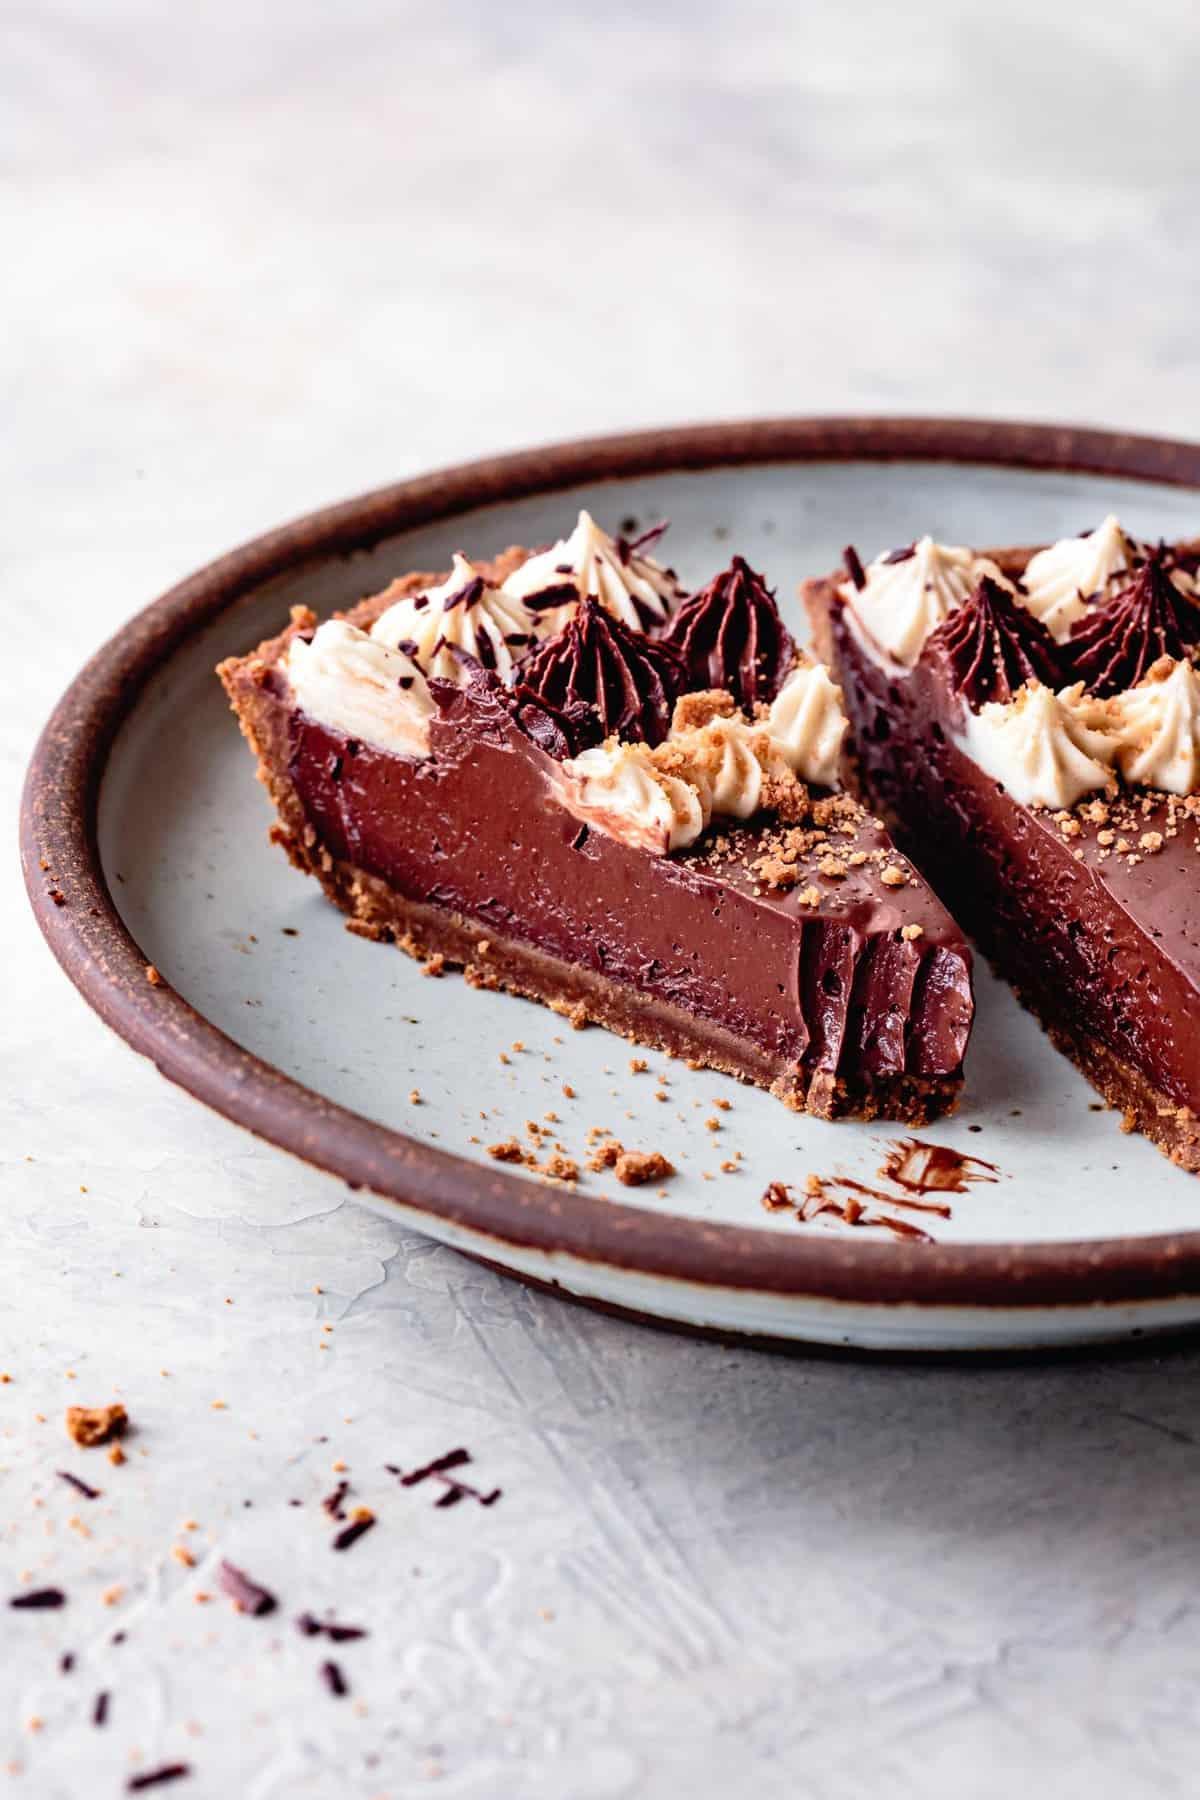 gluten free vegan chocolate pie slices on a blue plate